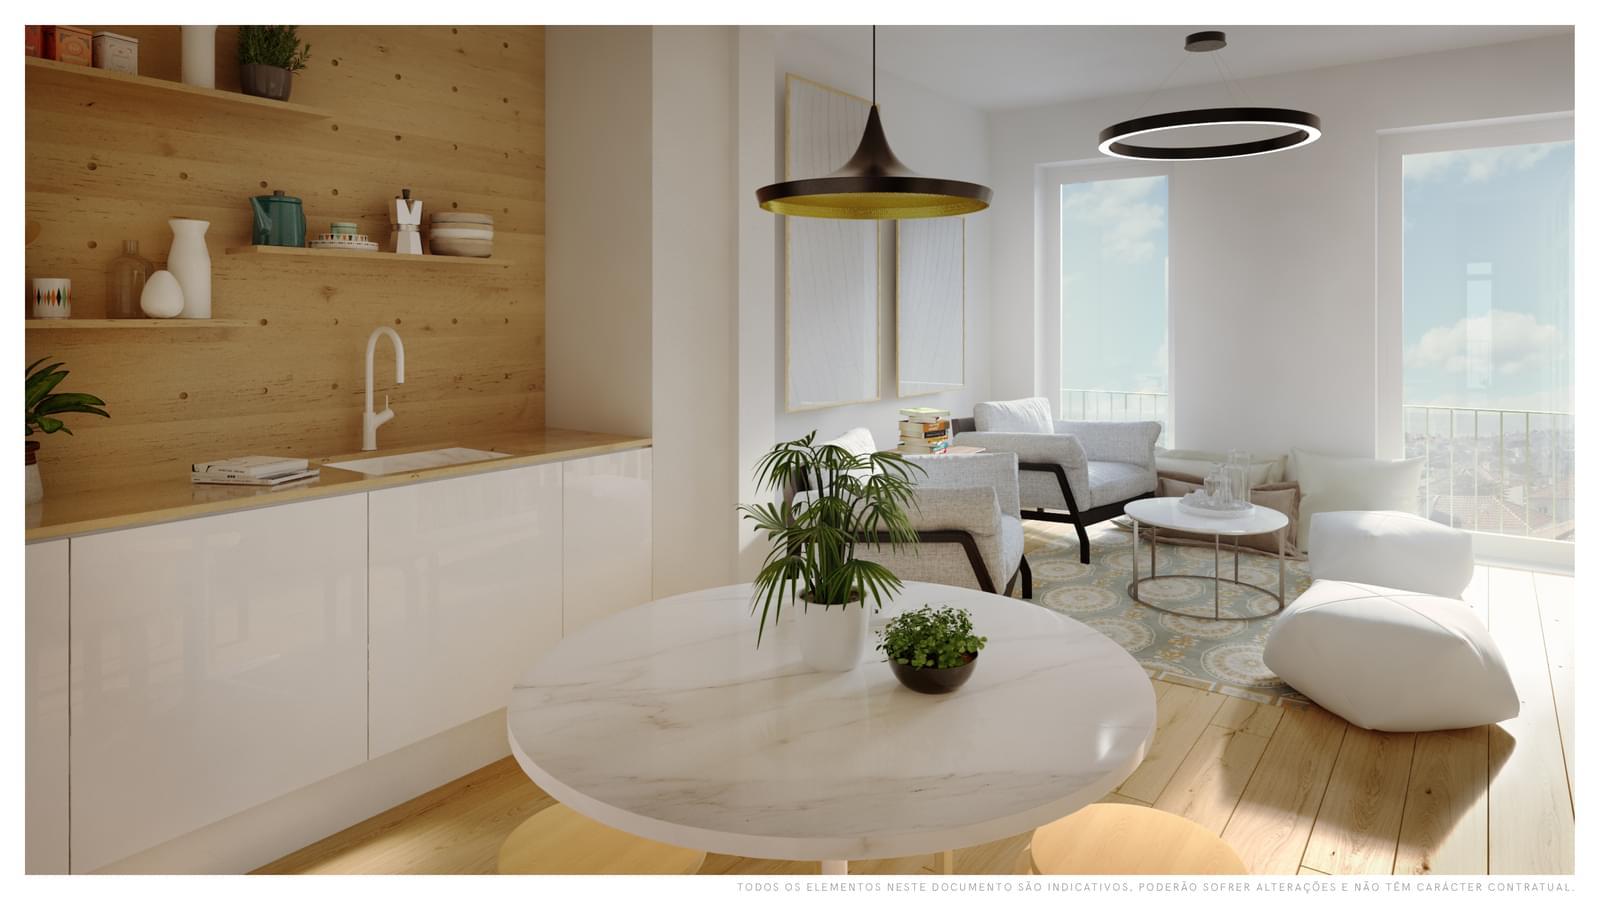 pf17325-apartamento-t3-lisboa-8816bf0c-1dd1-4cb8-9153-45a0425e0b8d